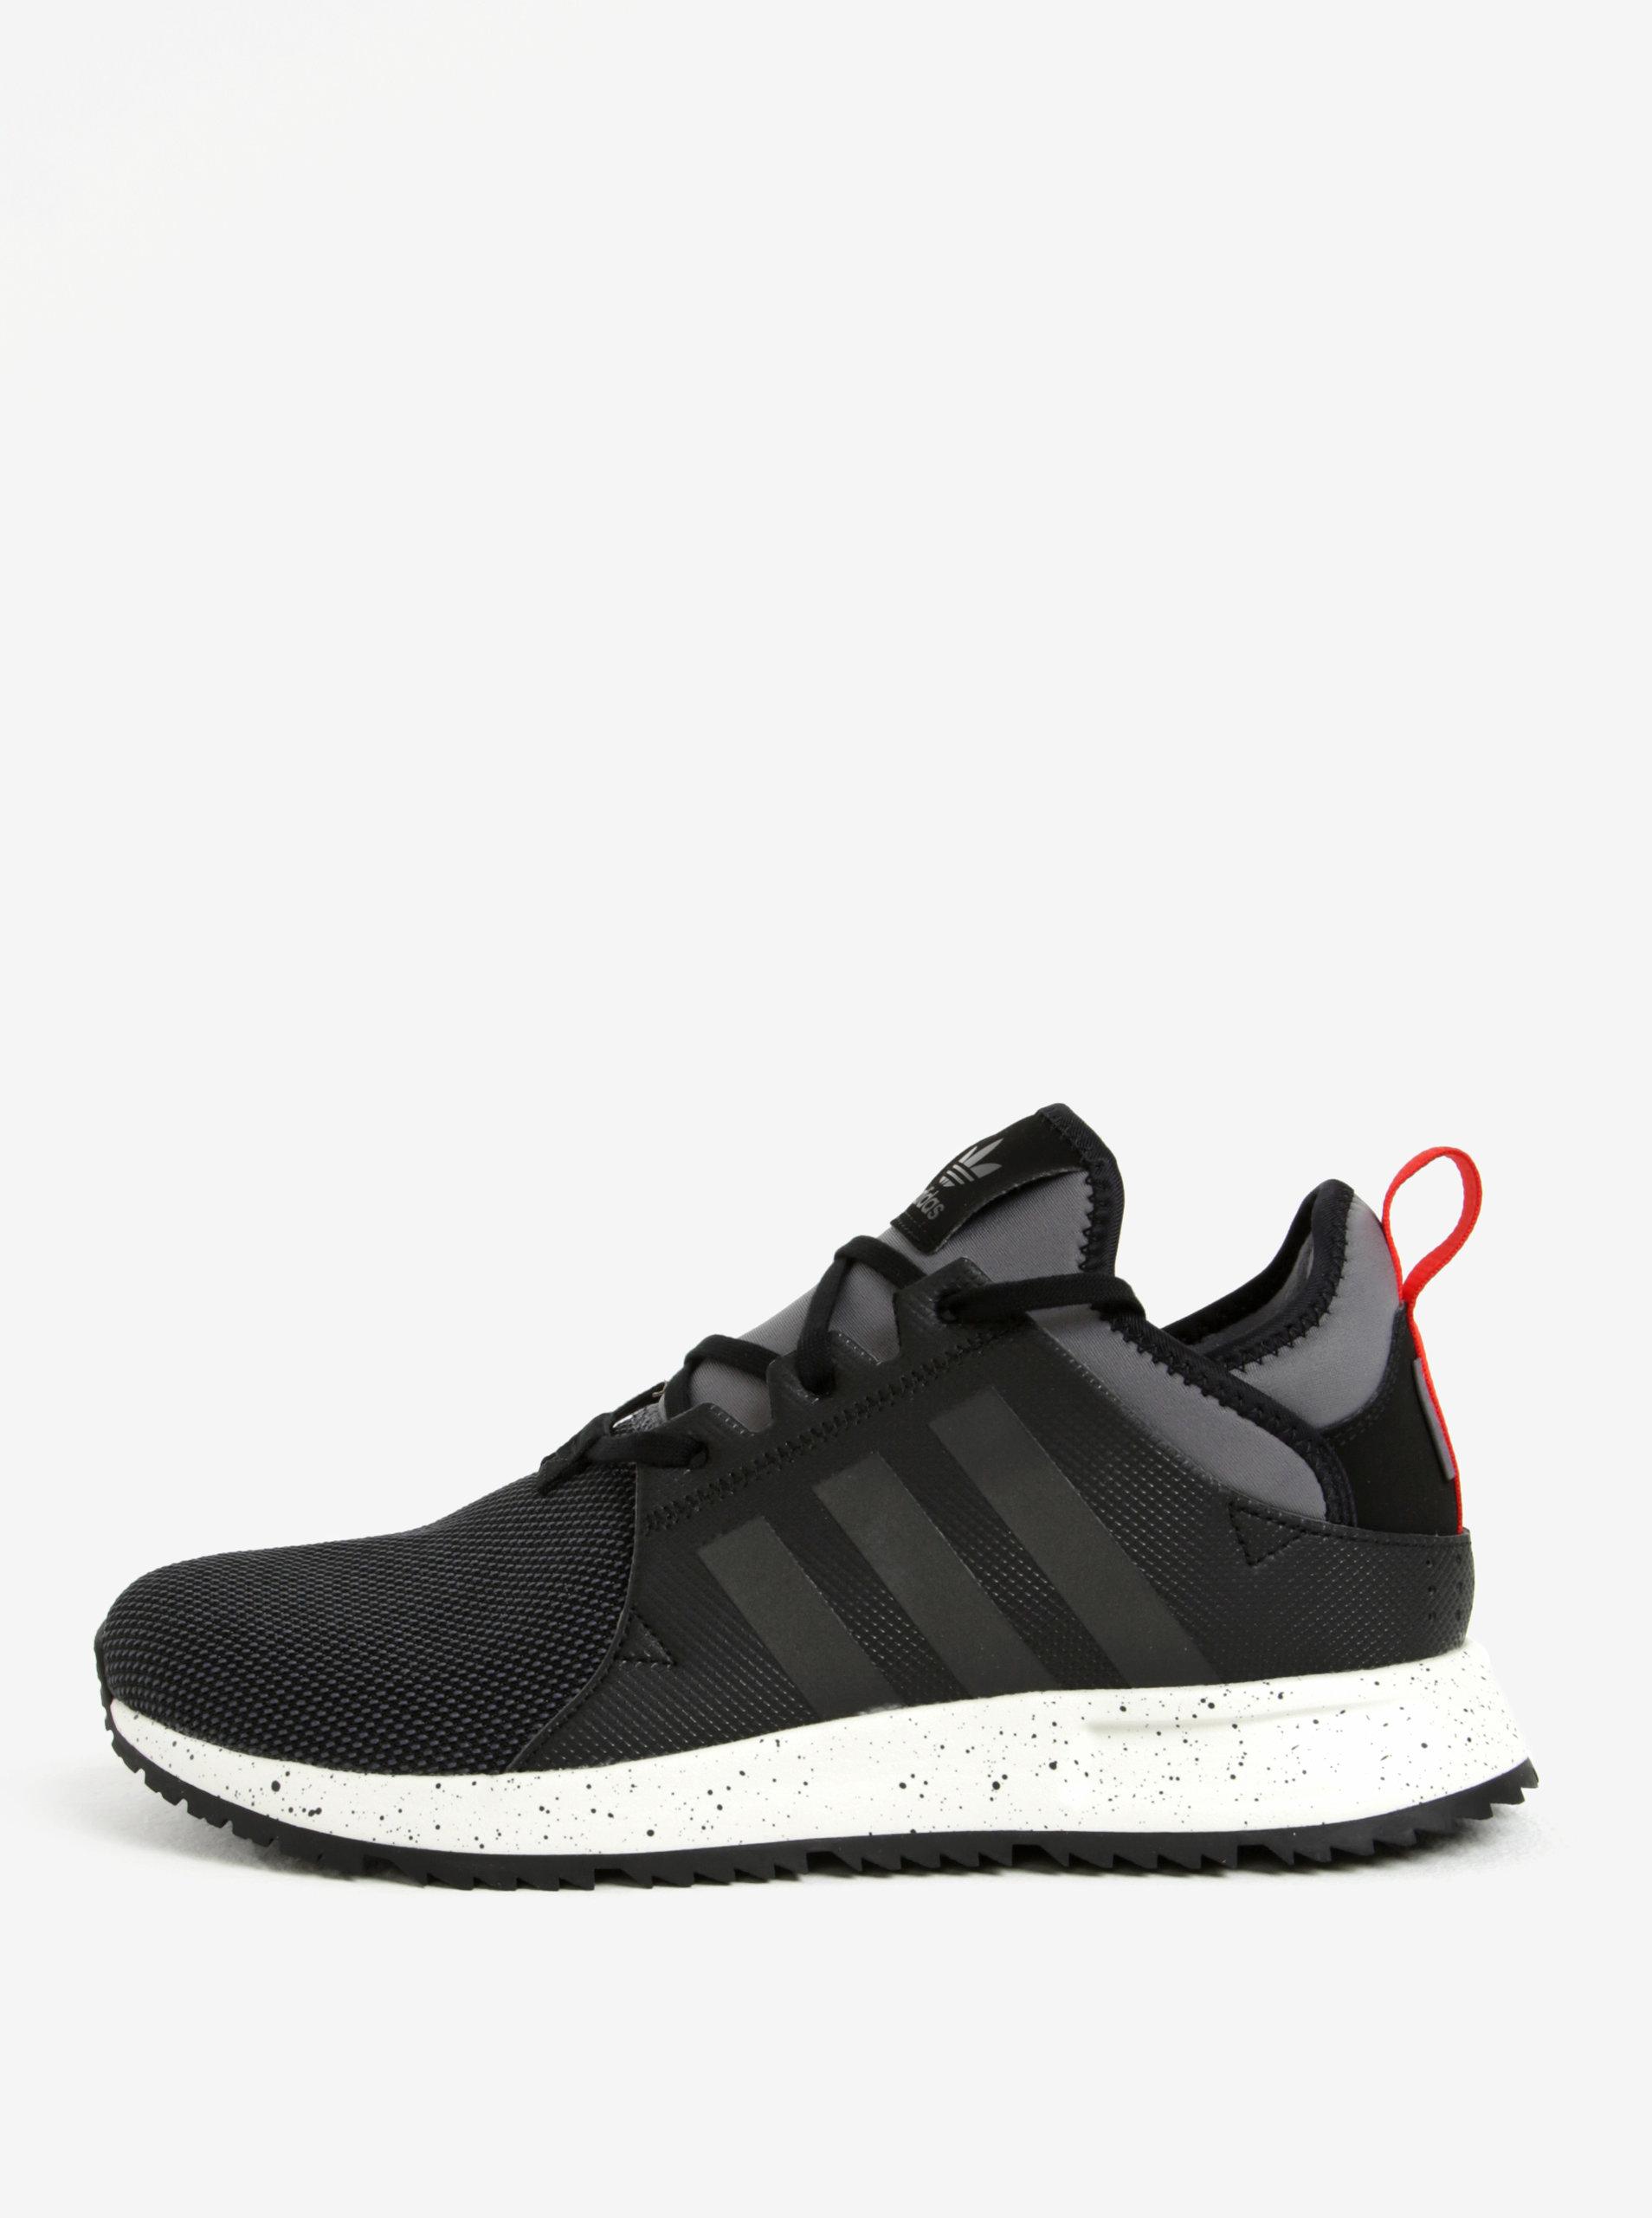 Sivo–čierne pánske tenisky adidas Originals PLR Sneakerboot ... 5973d7b34e8